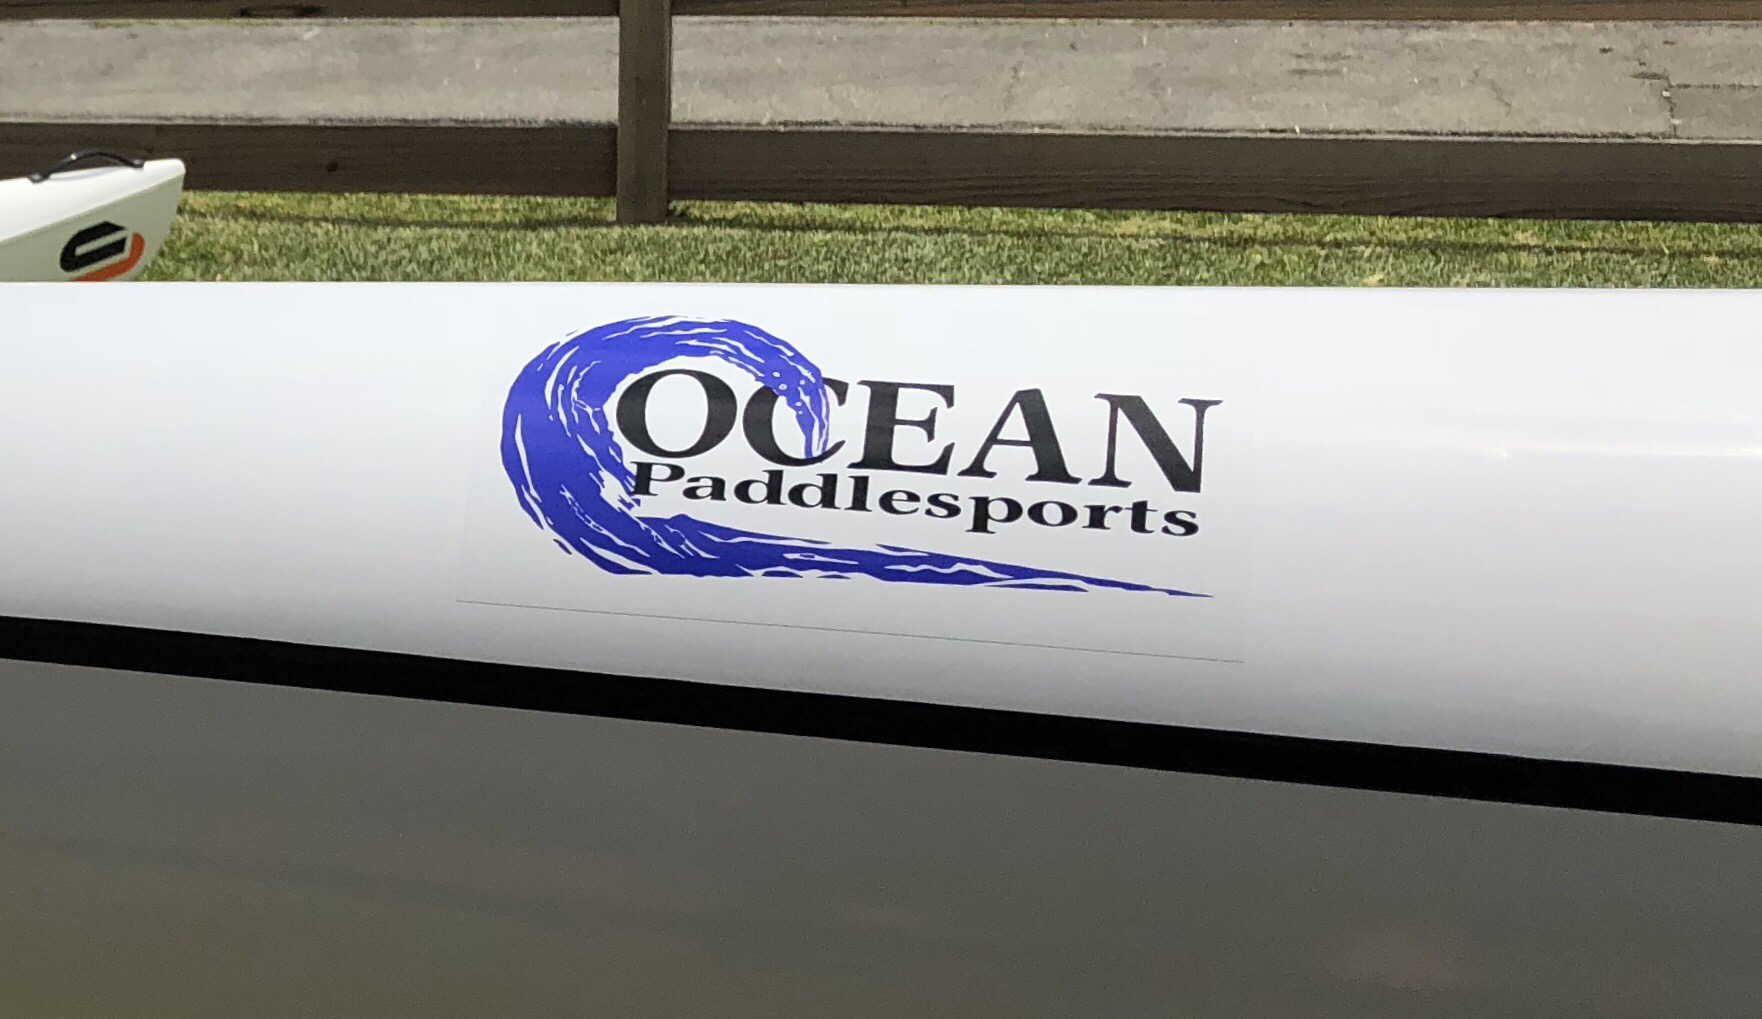 Ocean Paddlesports sticker 00198